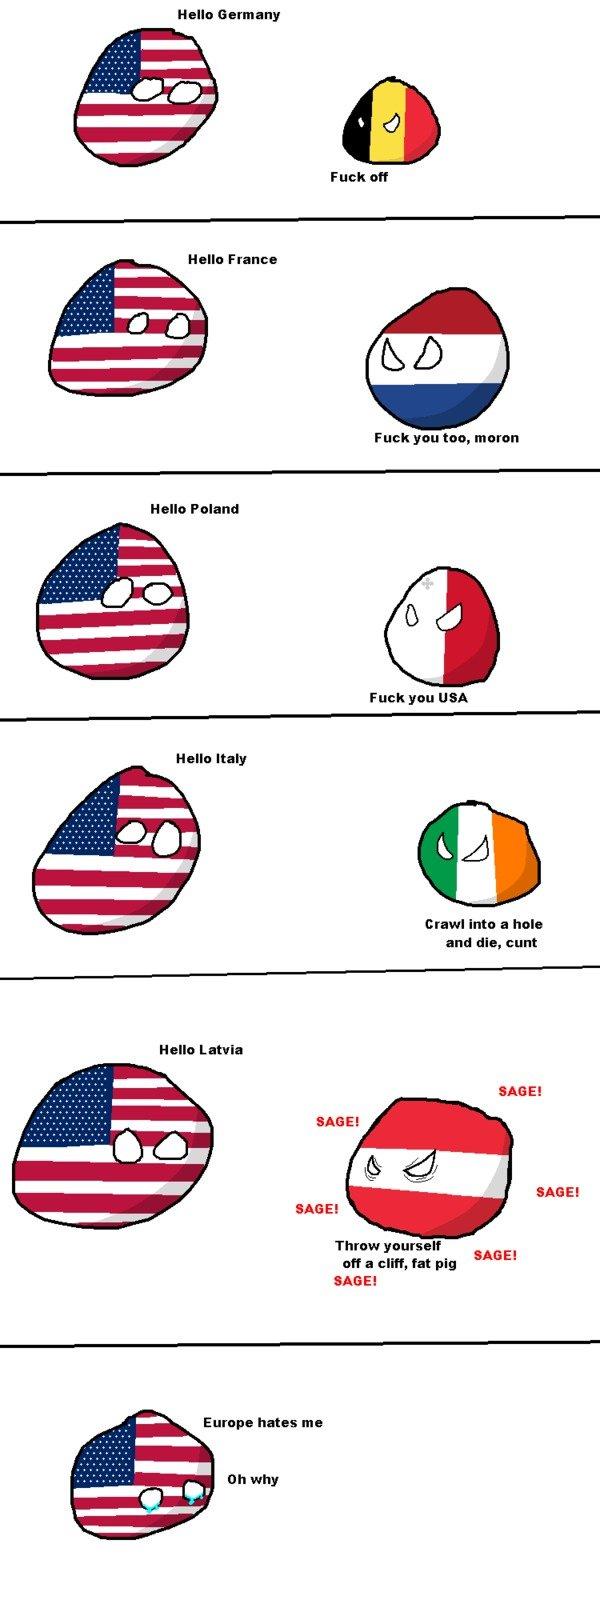 Why Europe be mean to America :(. Tags are Polandball. Hatted Barman; Halli: Fran an gnu too, moron Hallo Fulani! . gnu USA tram Int: hula and die, cunt Halli: